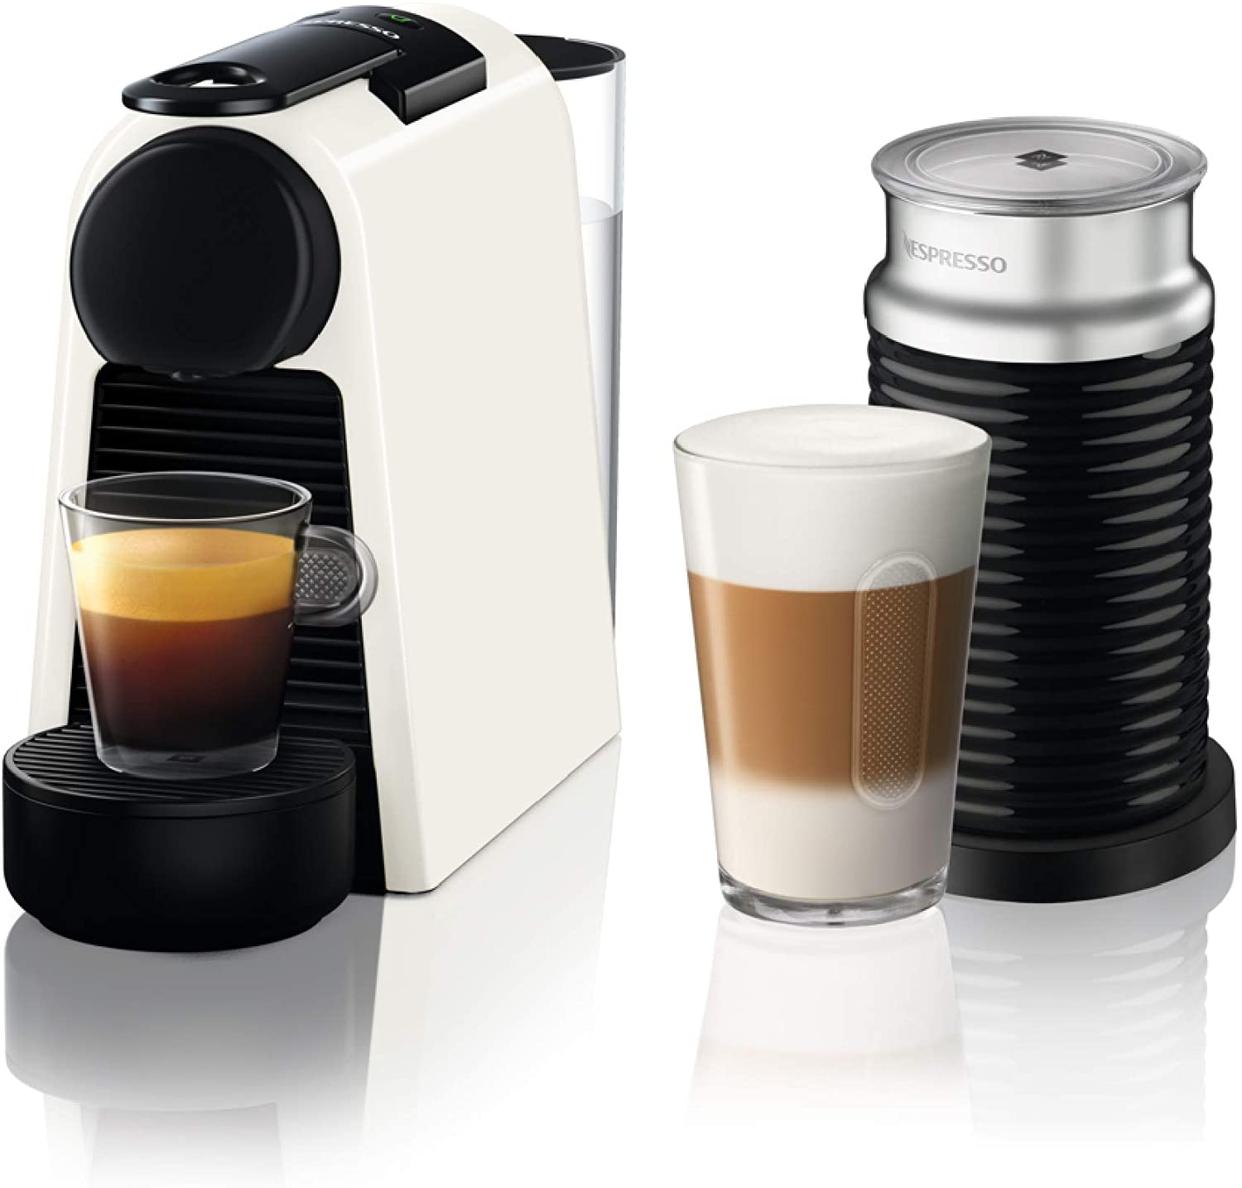 Nespresso(ネスプレッソ) エッセンサ ミニ バンドルセット D30の商品画像